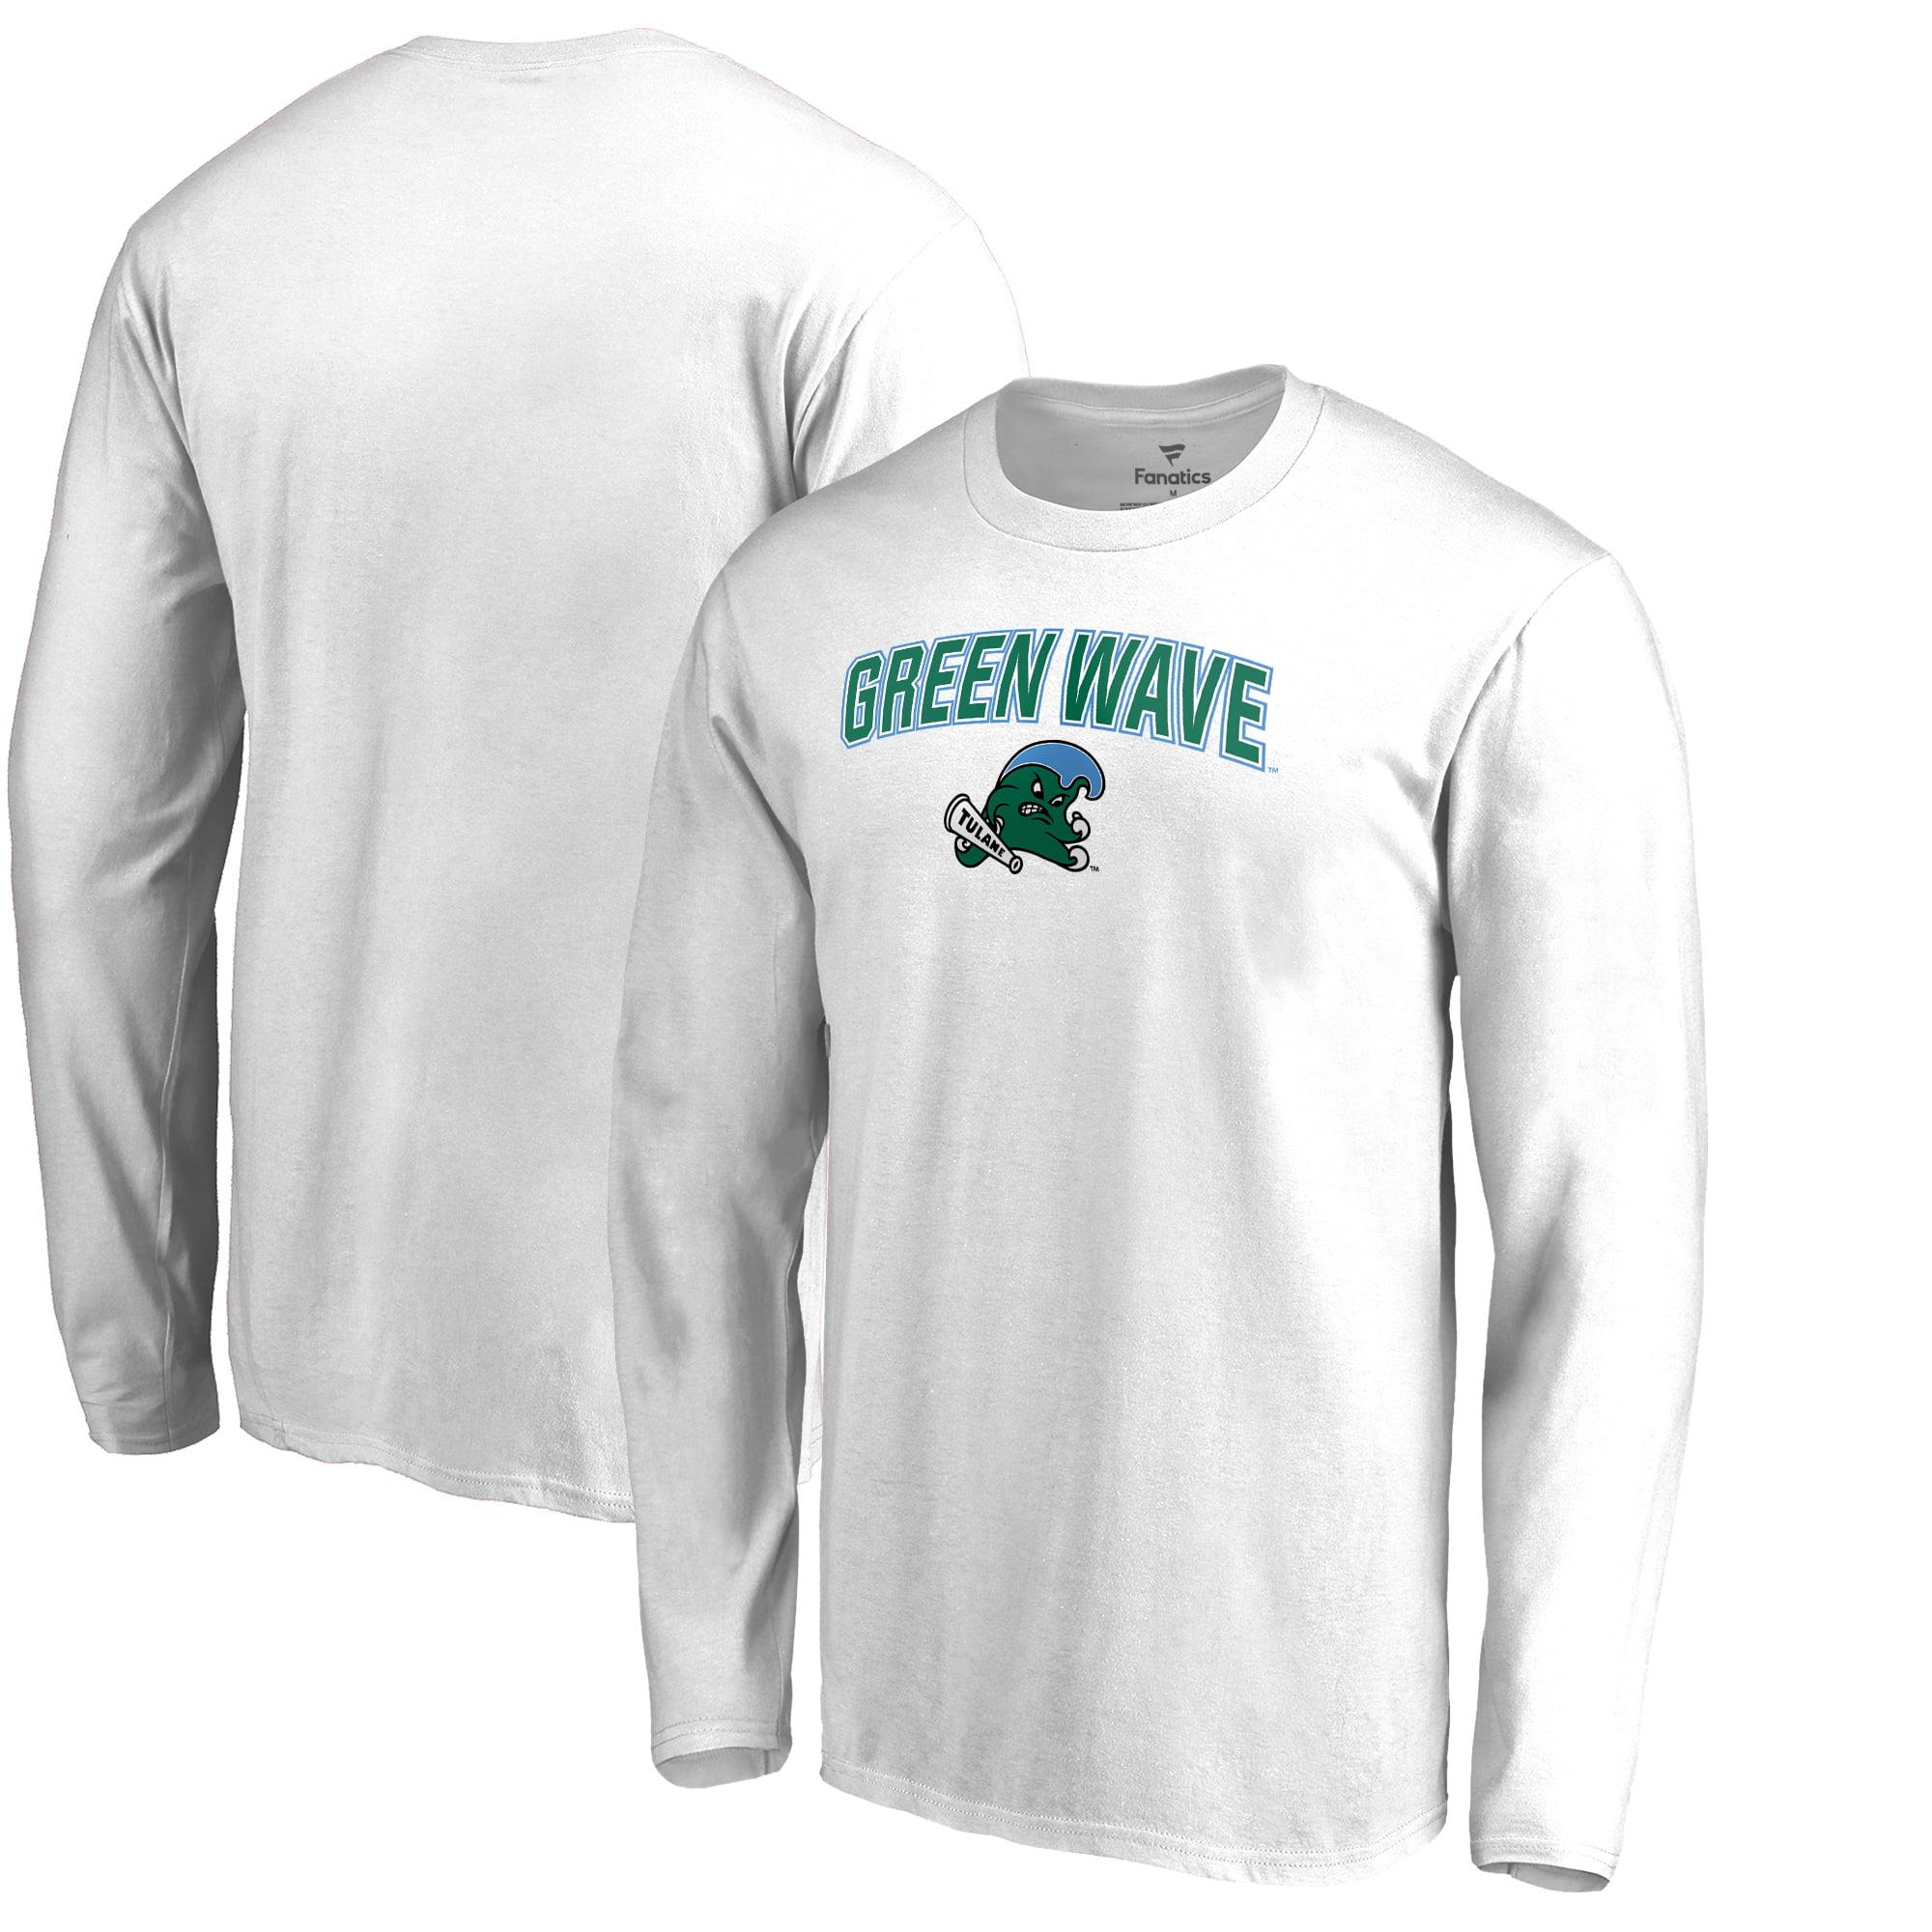 lowest price 9c4c3 1afb9 Tulane Green Wave Proud Mascot Long Sleeve T-Shirt - White - - Walmart.com